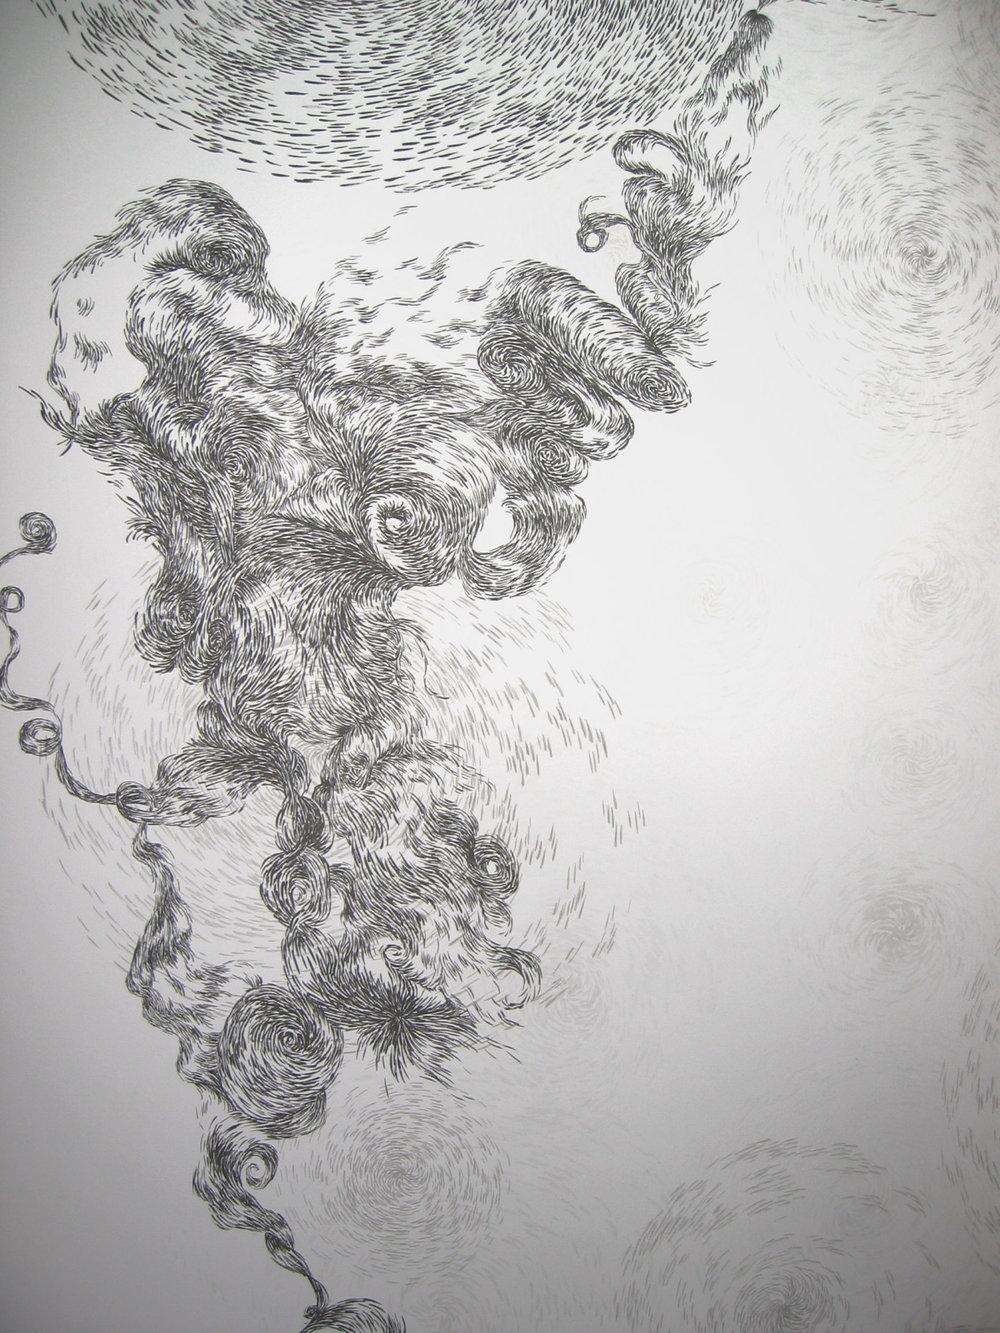 Roil 3 - Detail